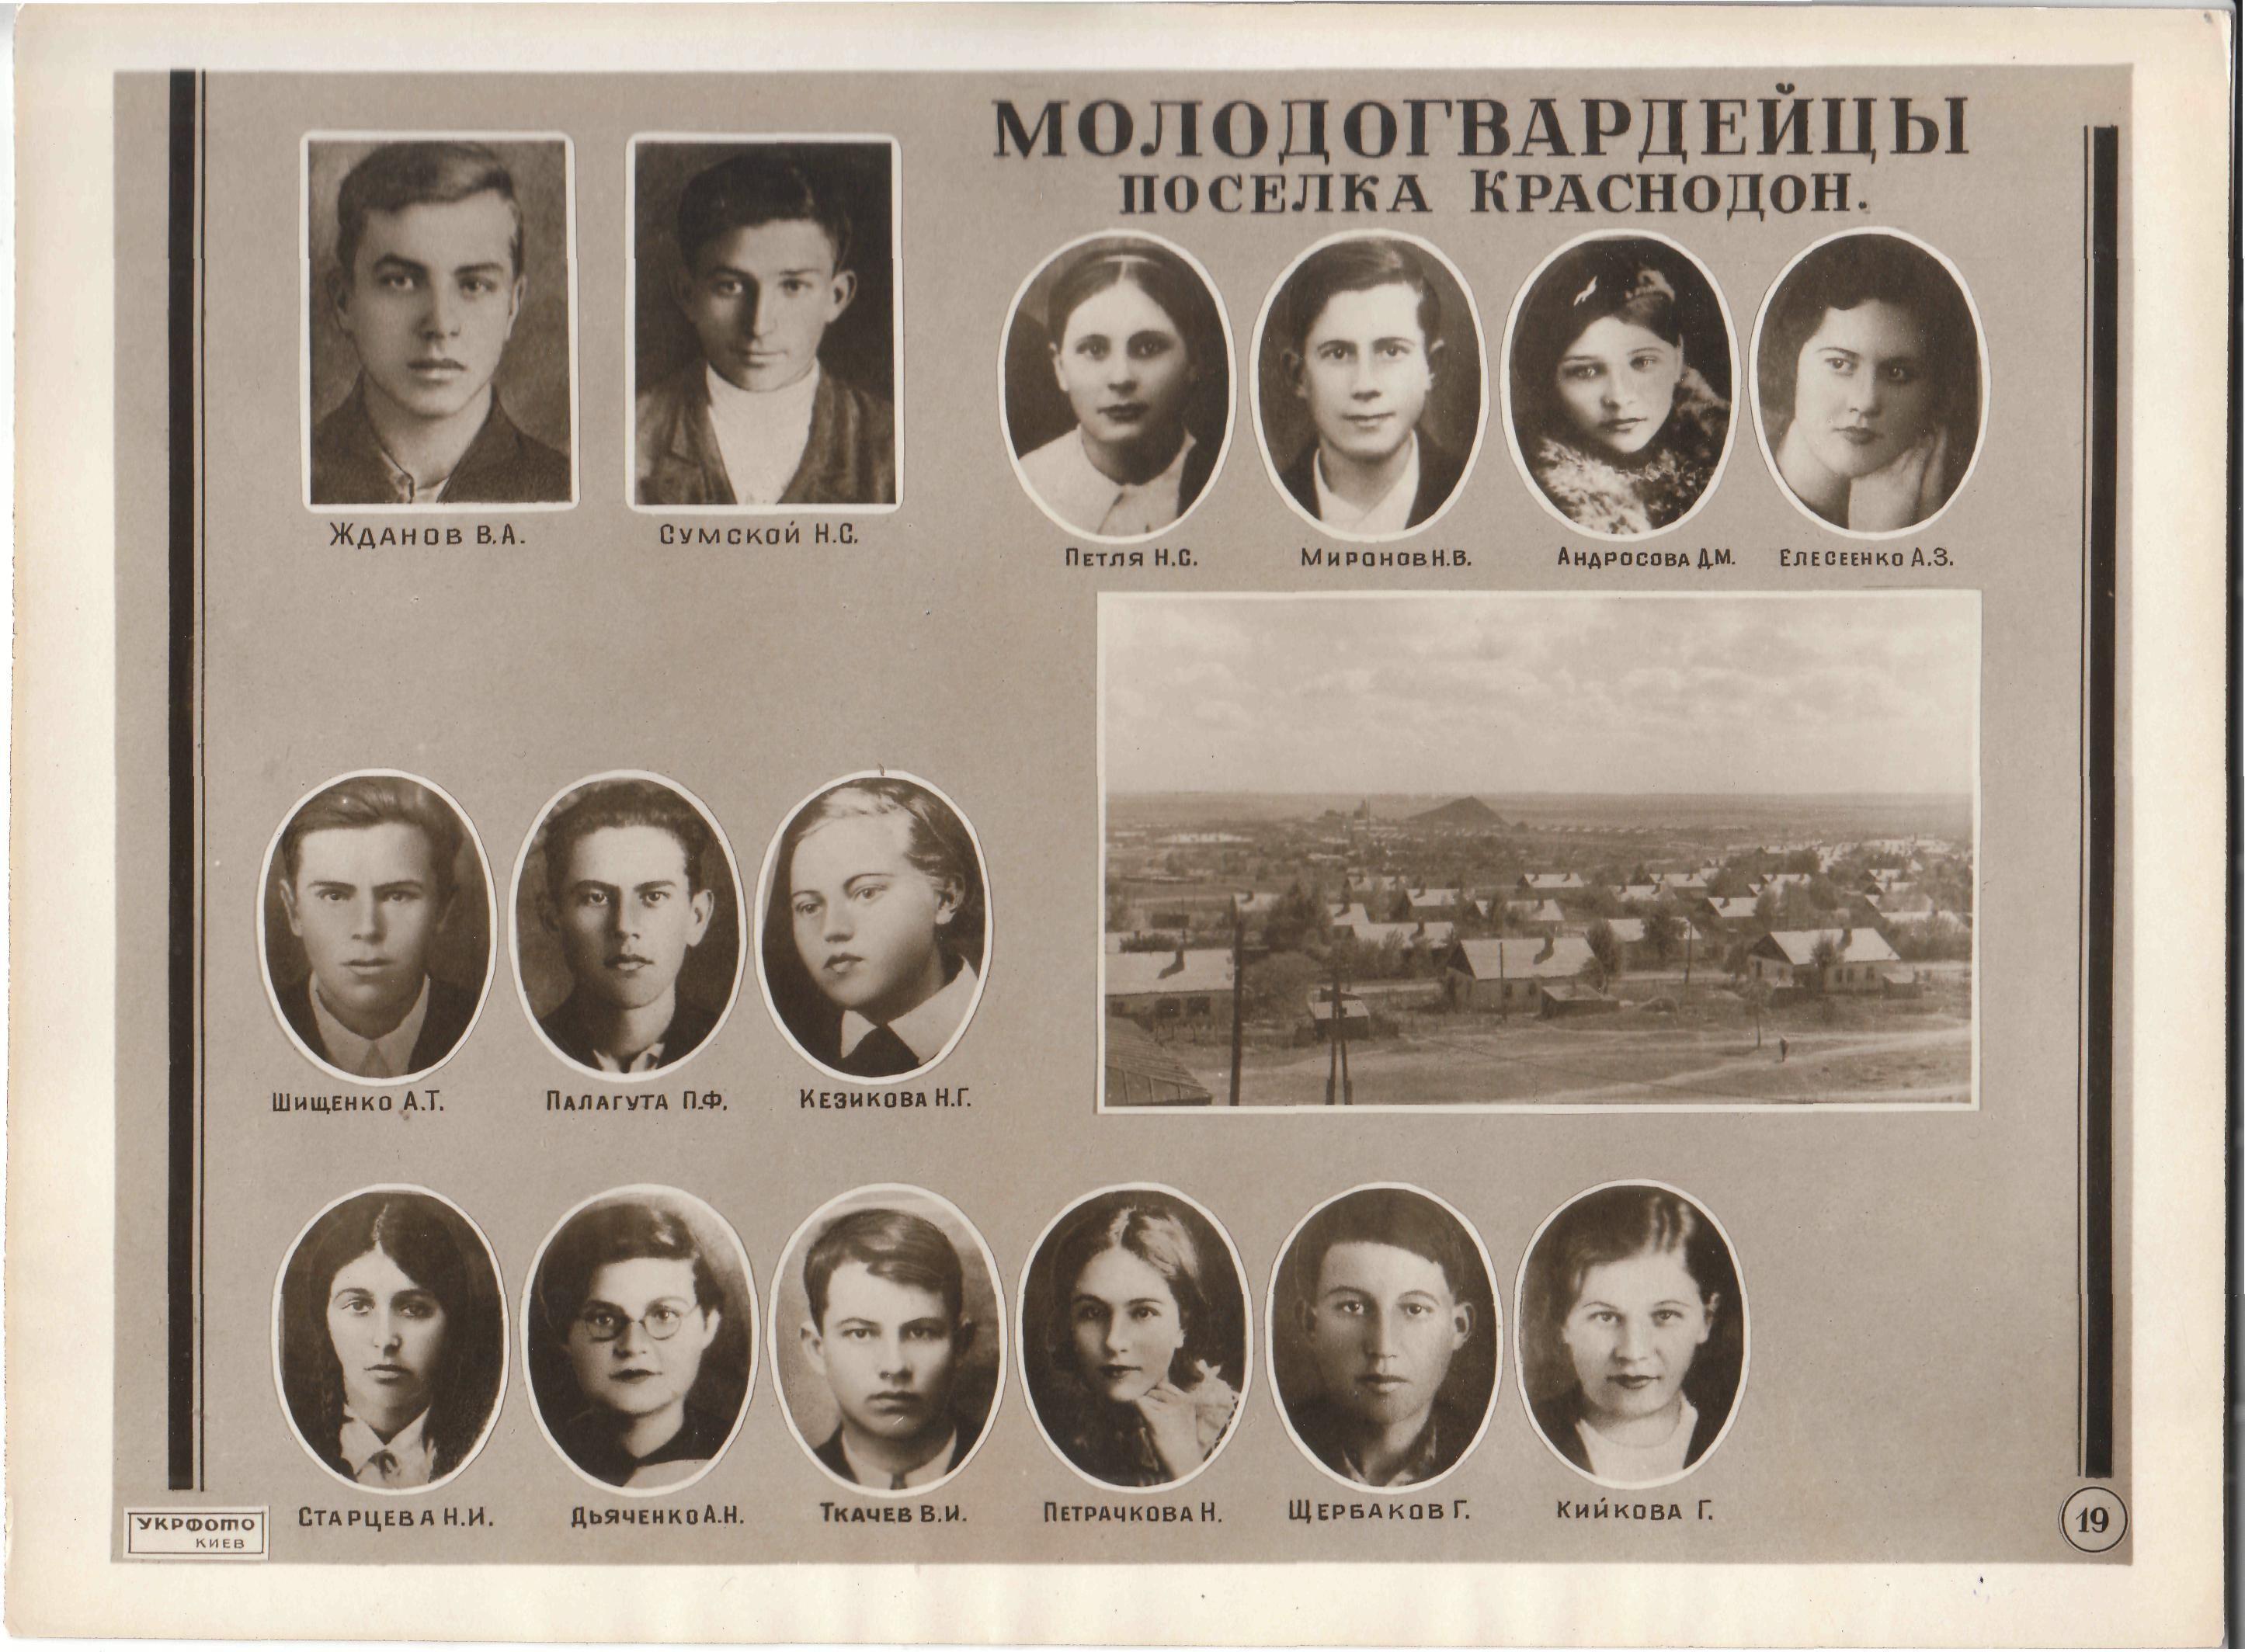 фотографии краснодона молодогвардейцев